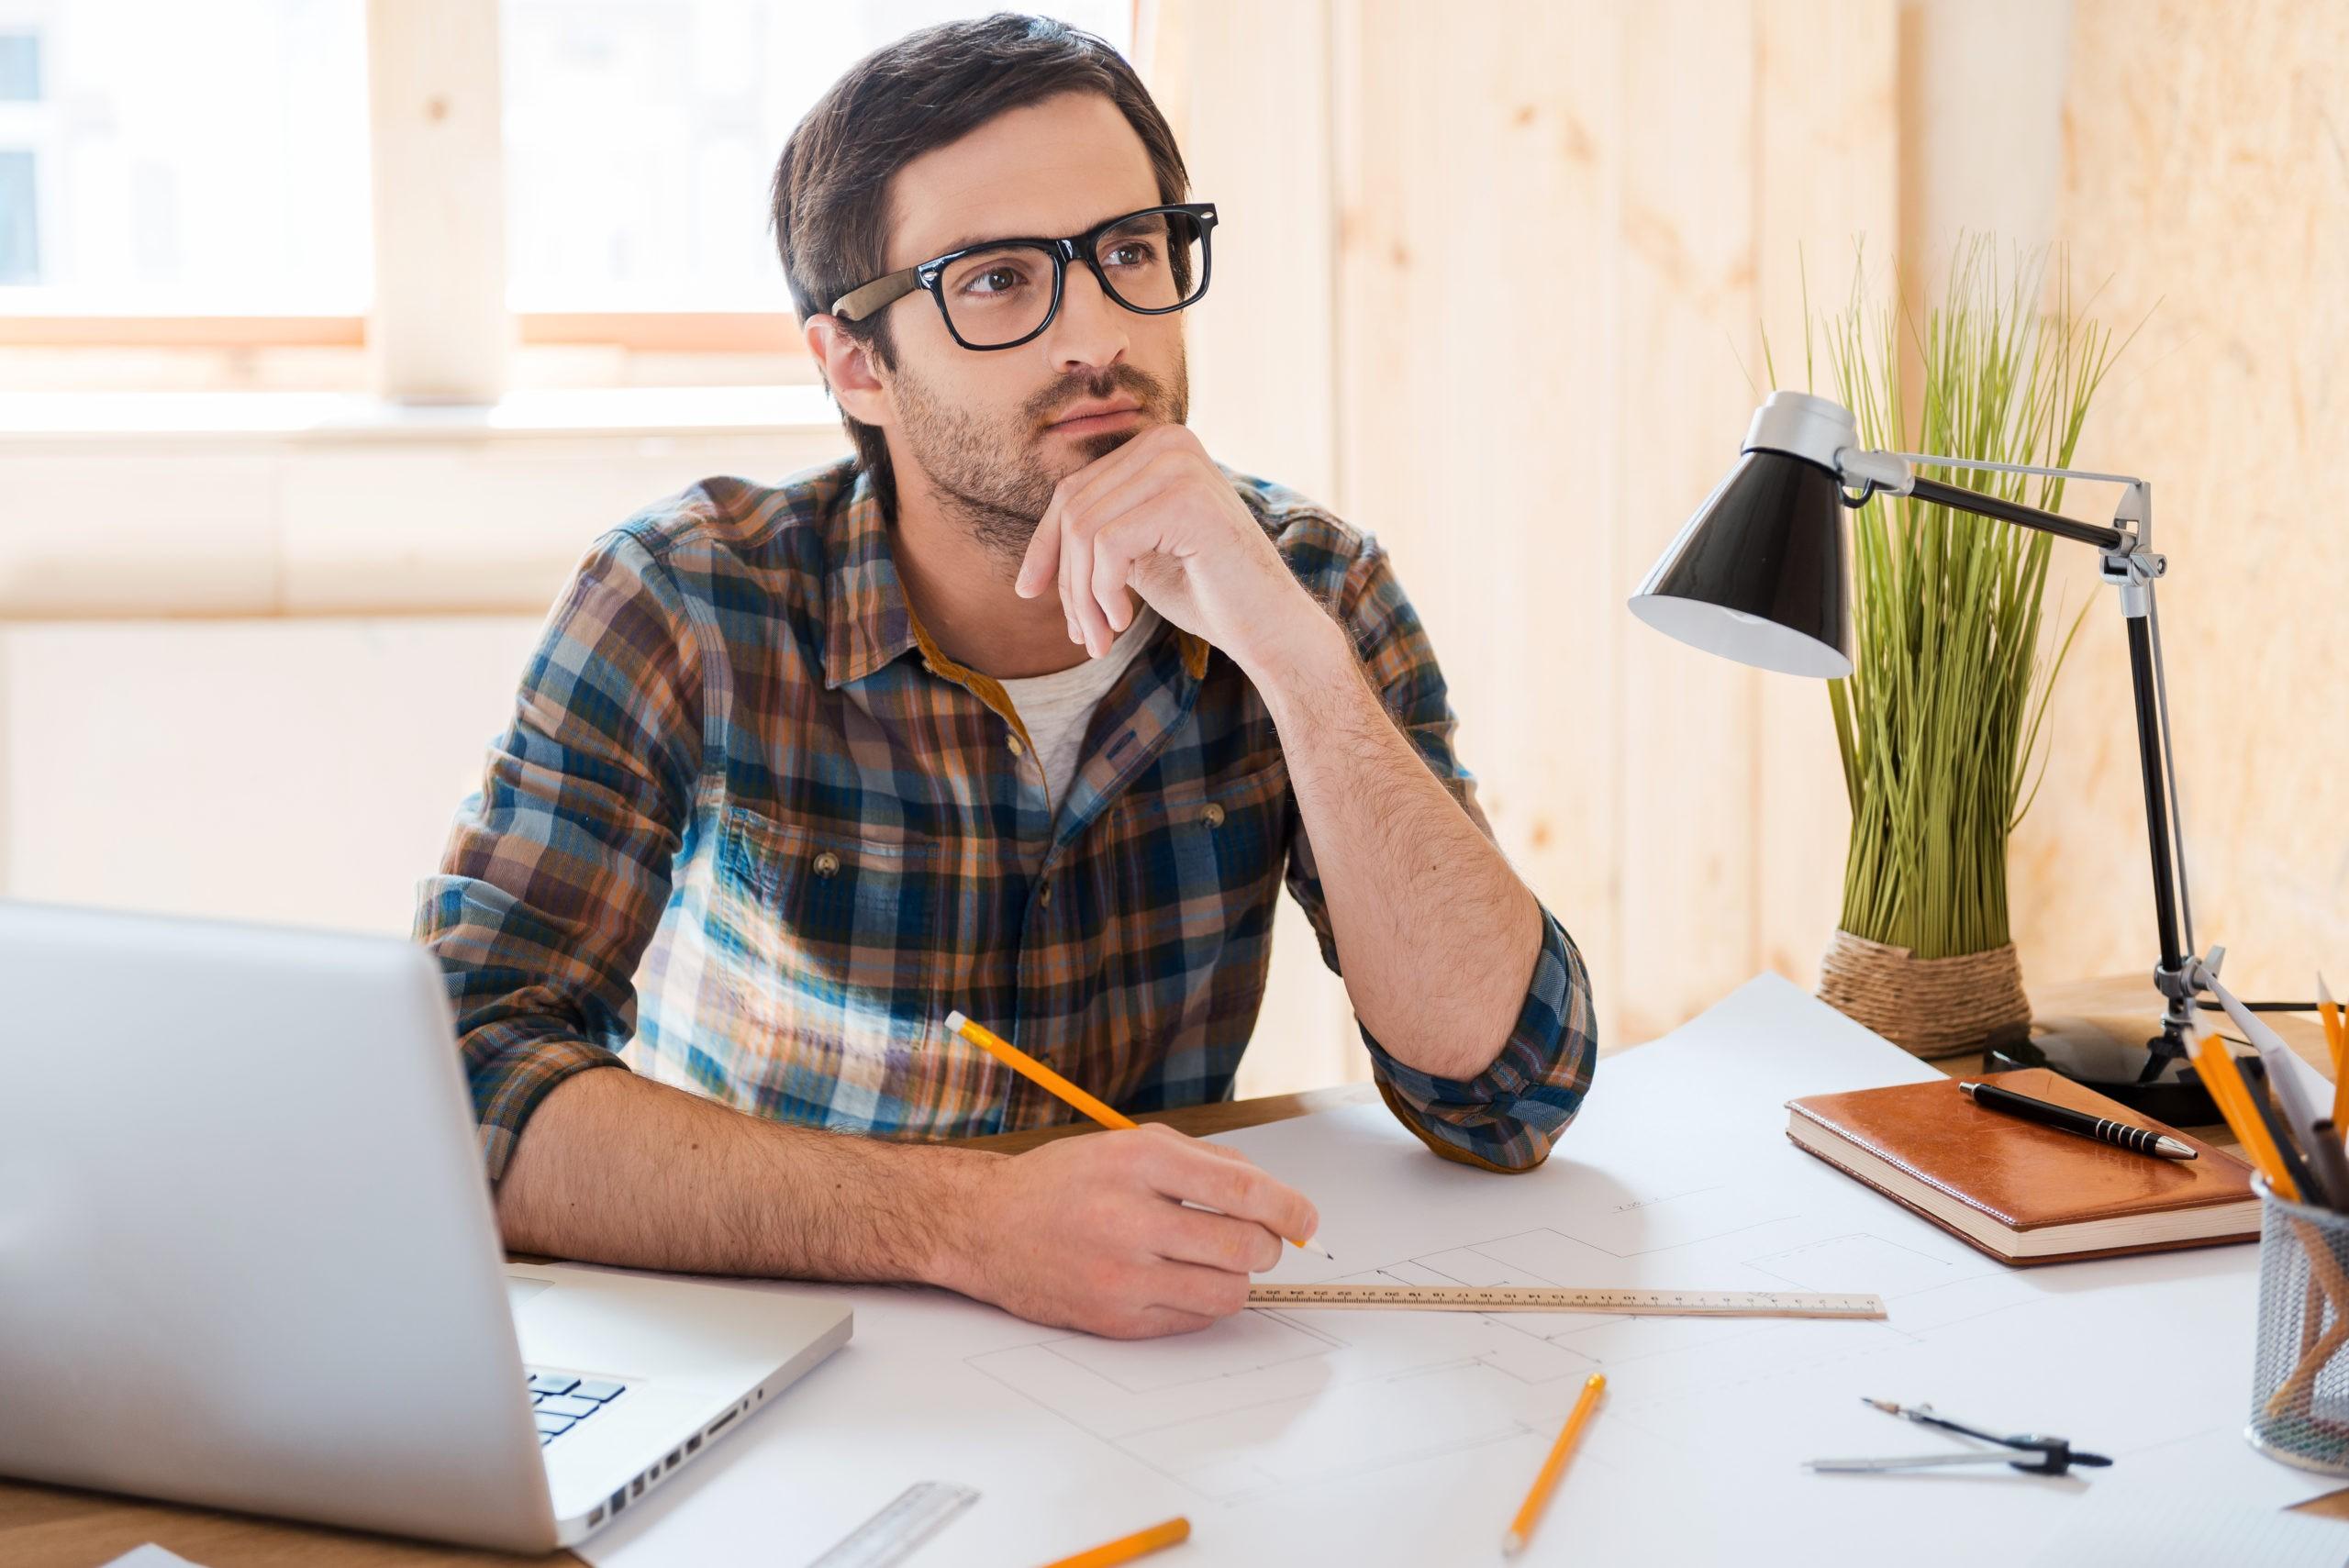 Man Thinking sitting at computer scaled